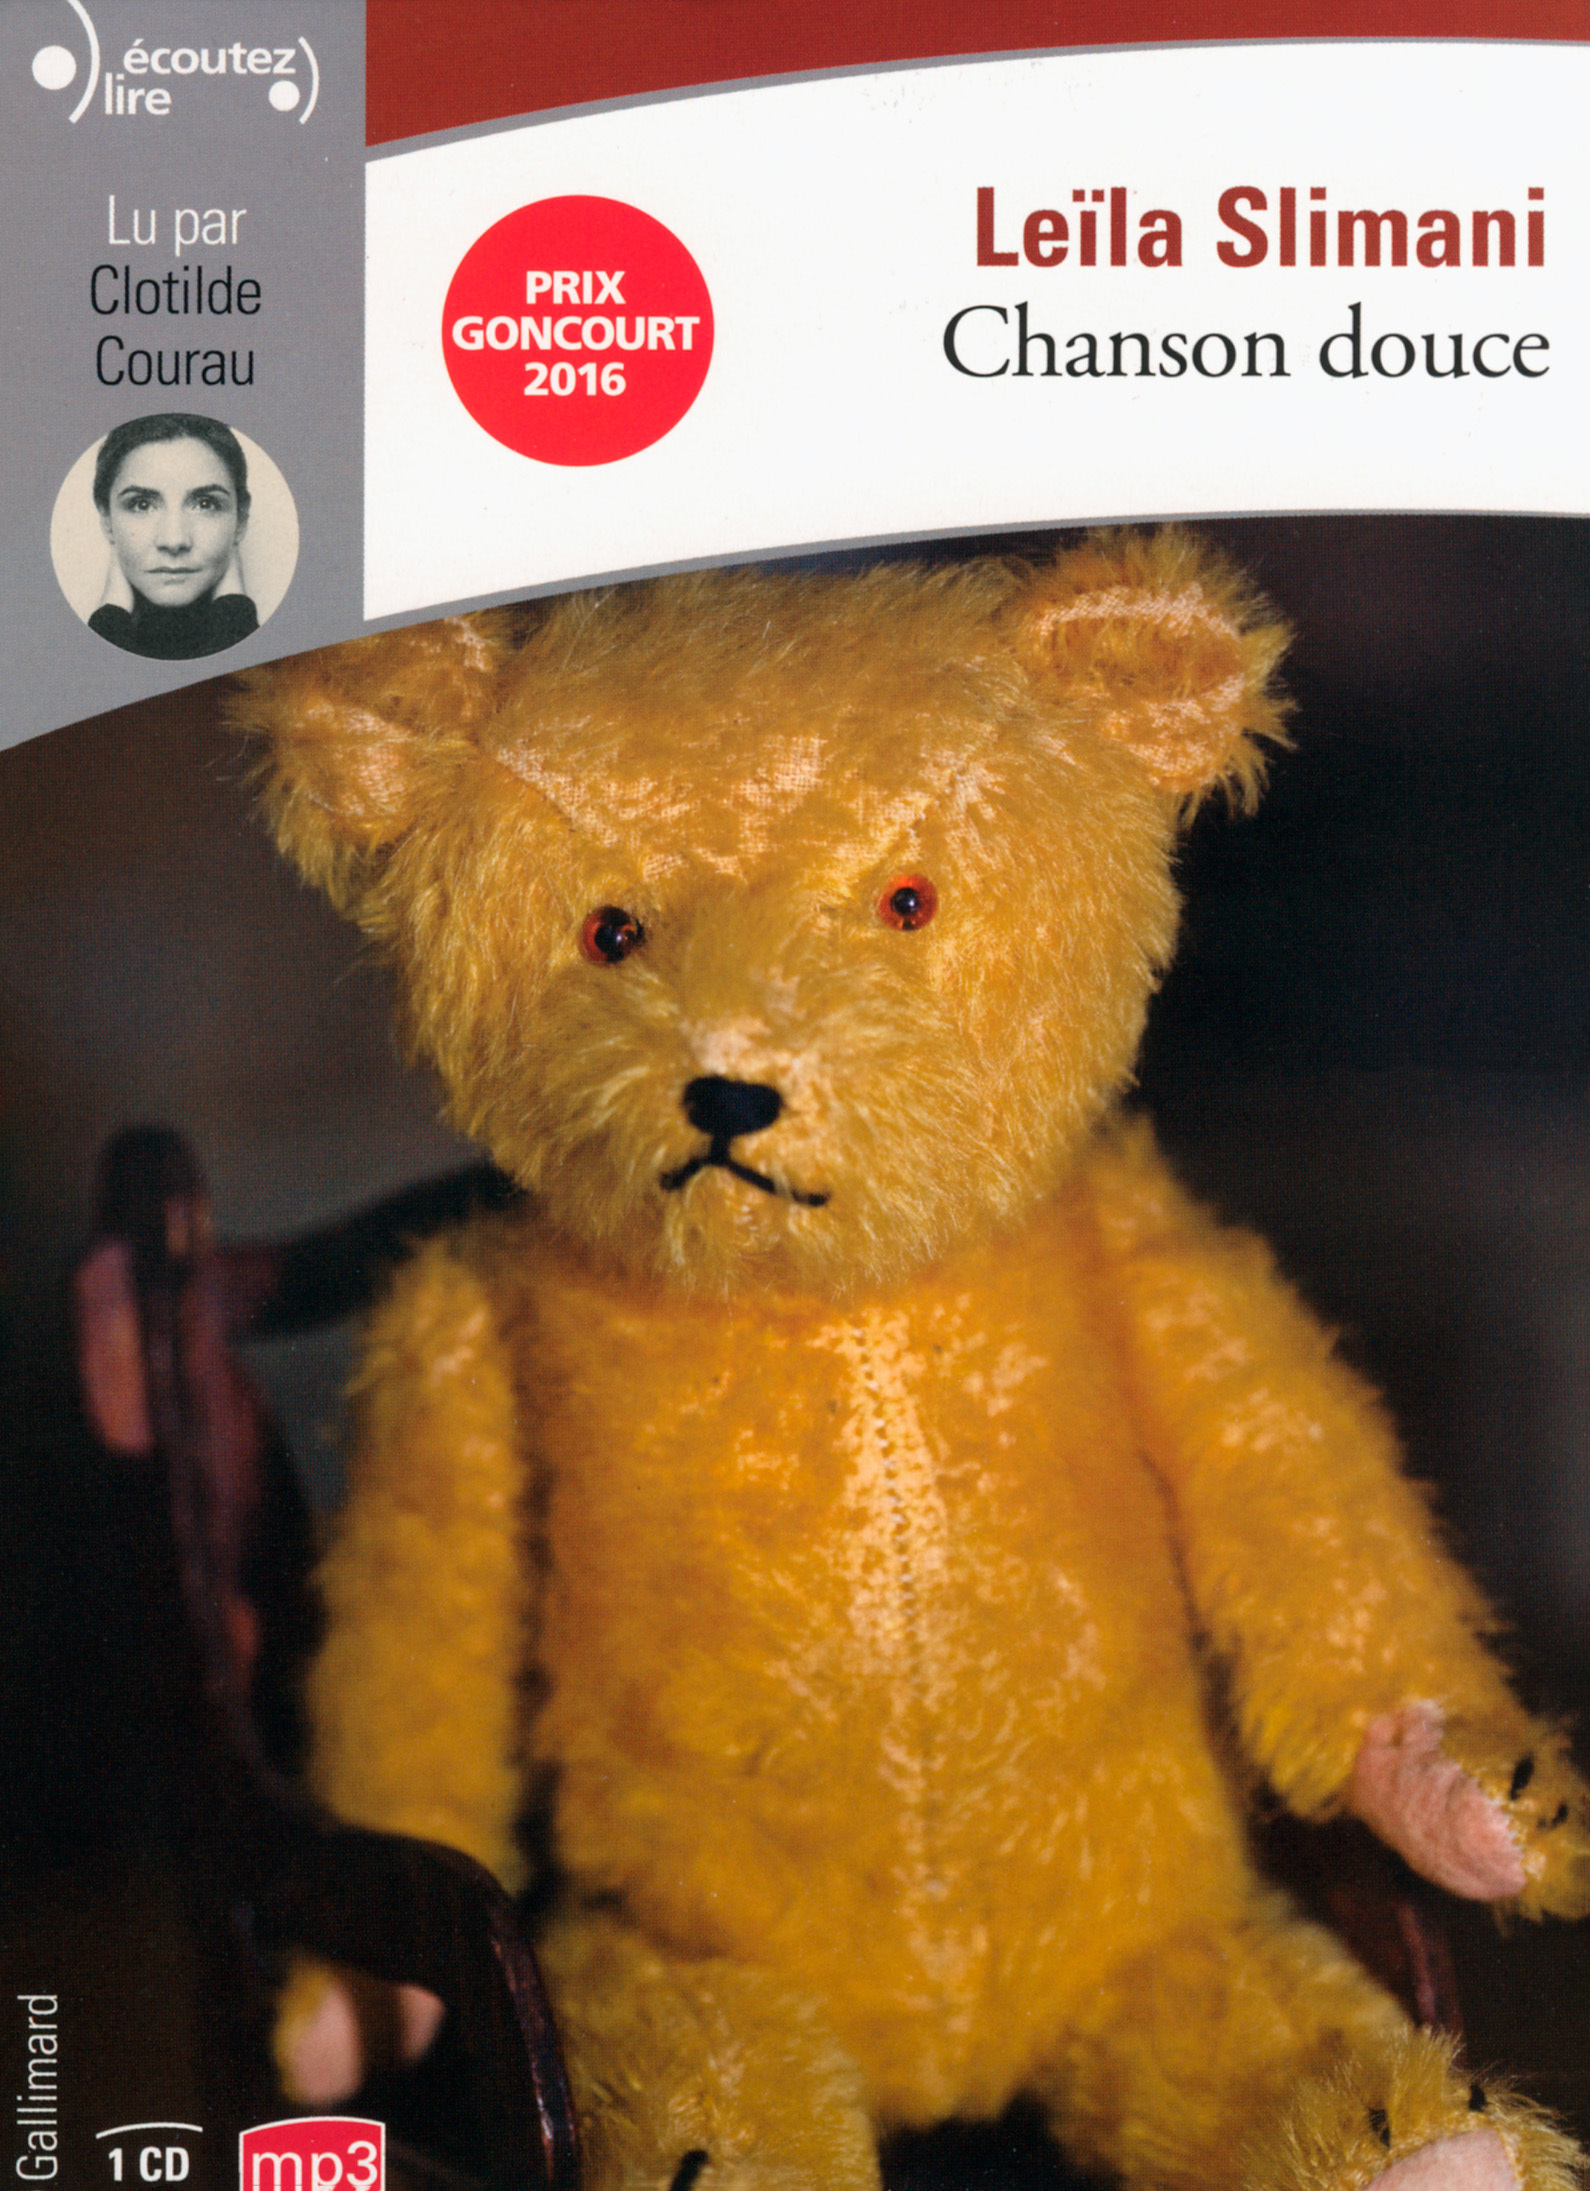 CHANSON DOUCE CD